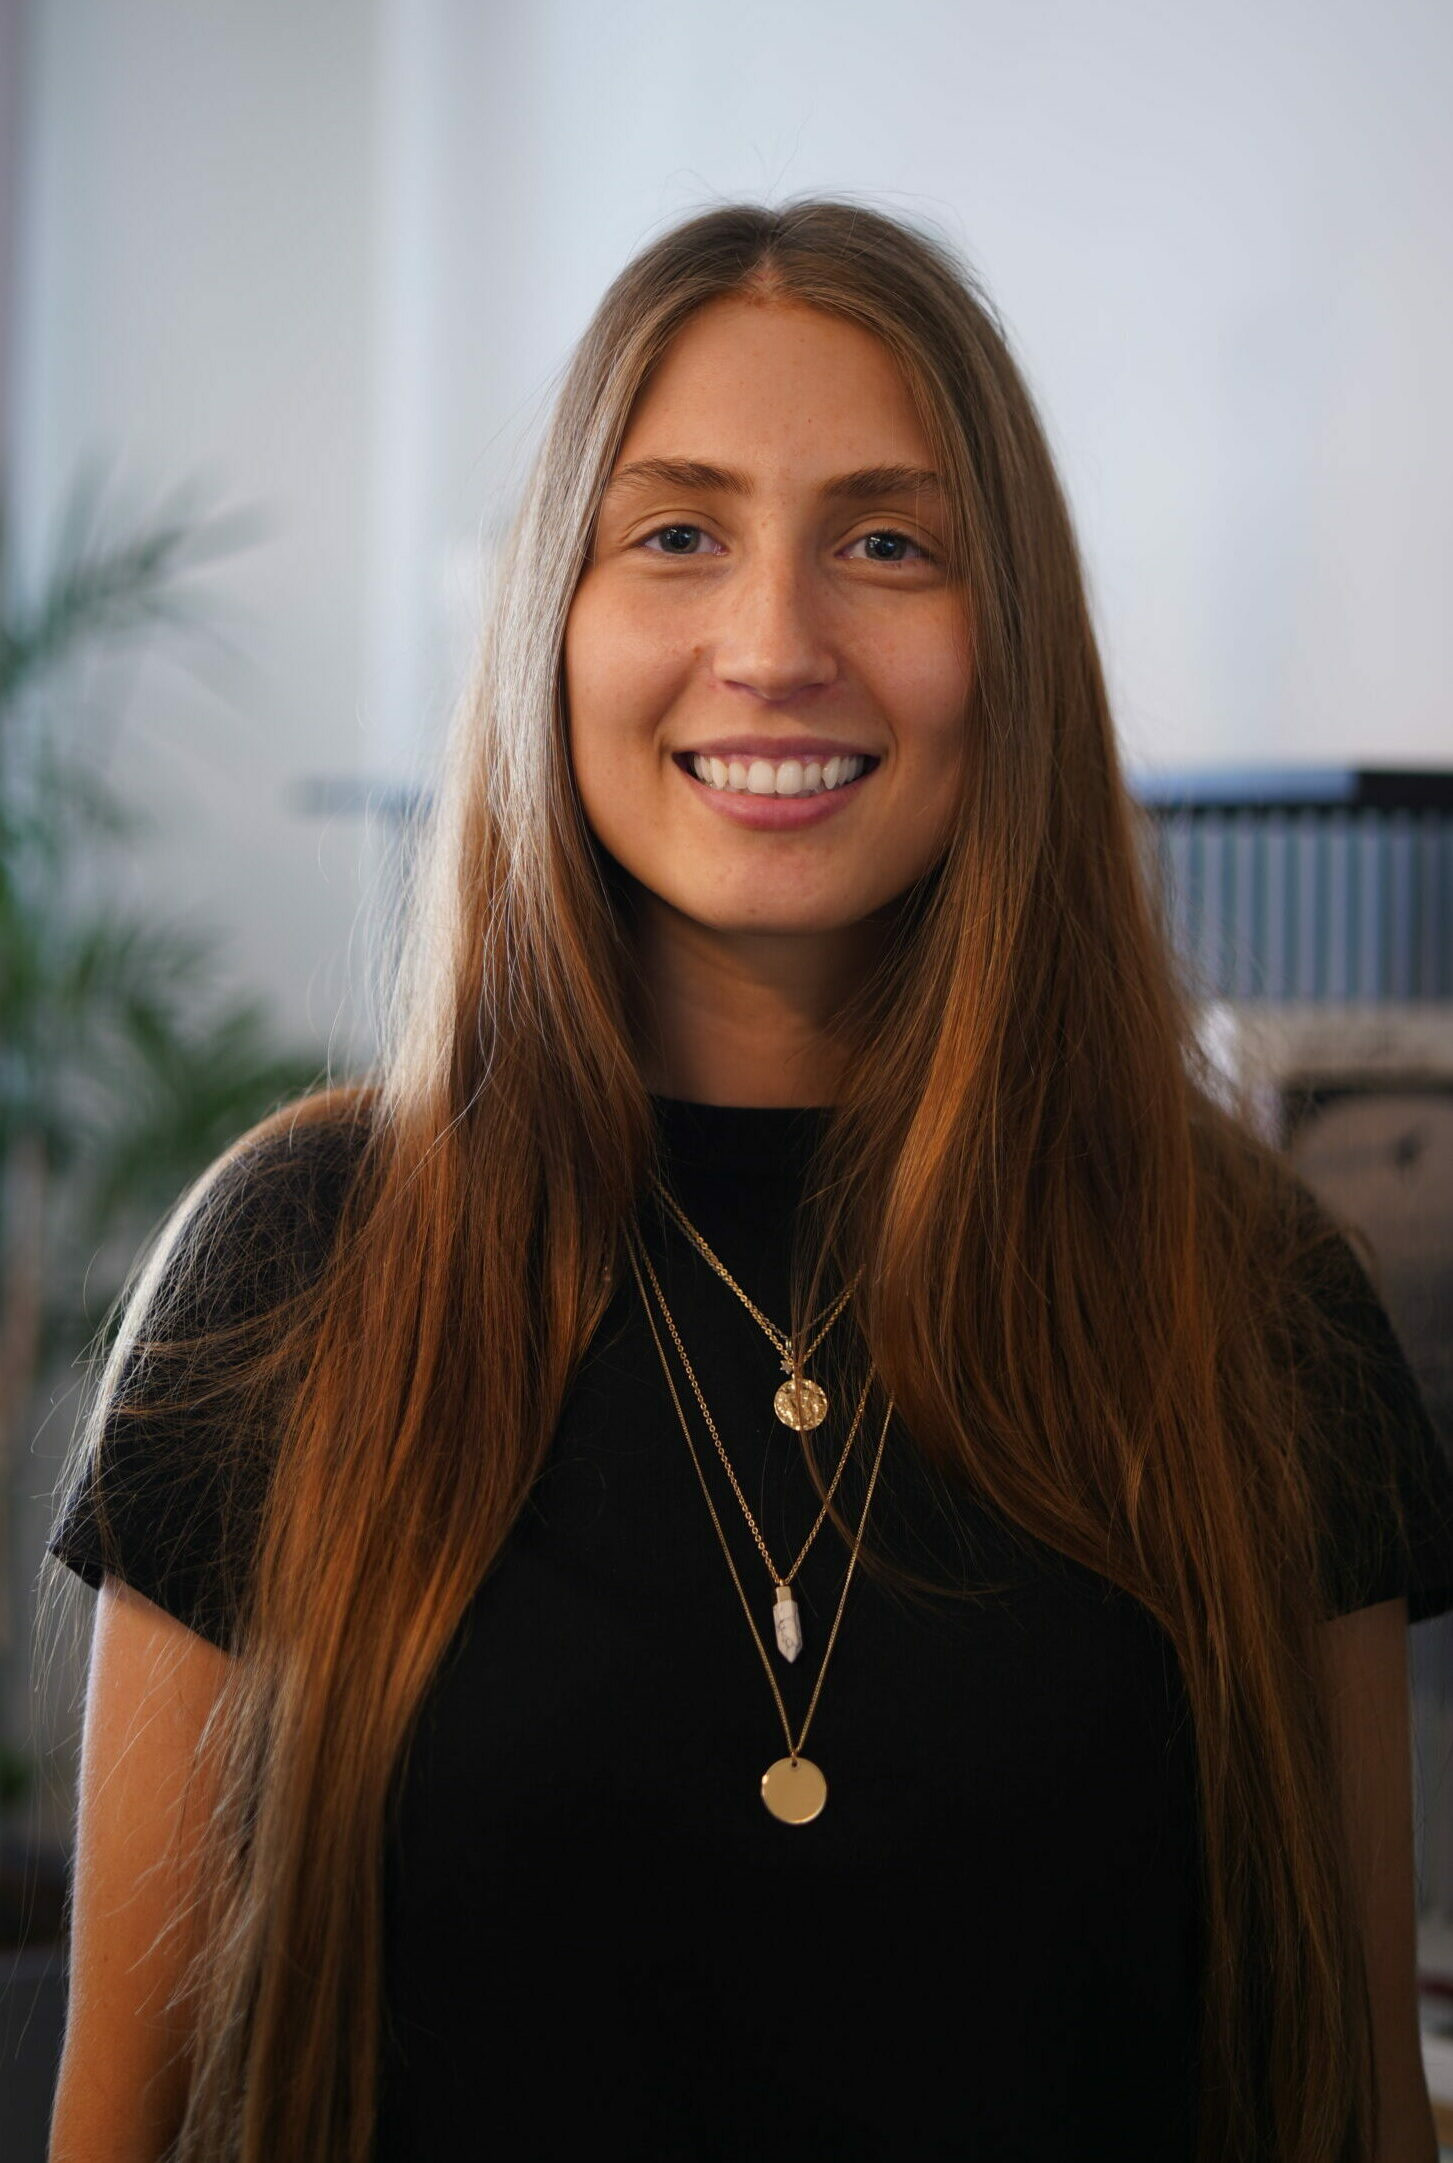 Jessica Amado